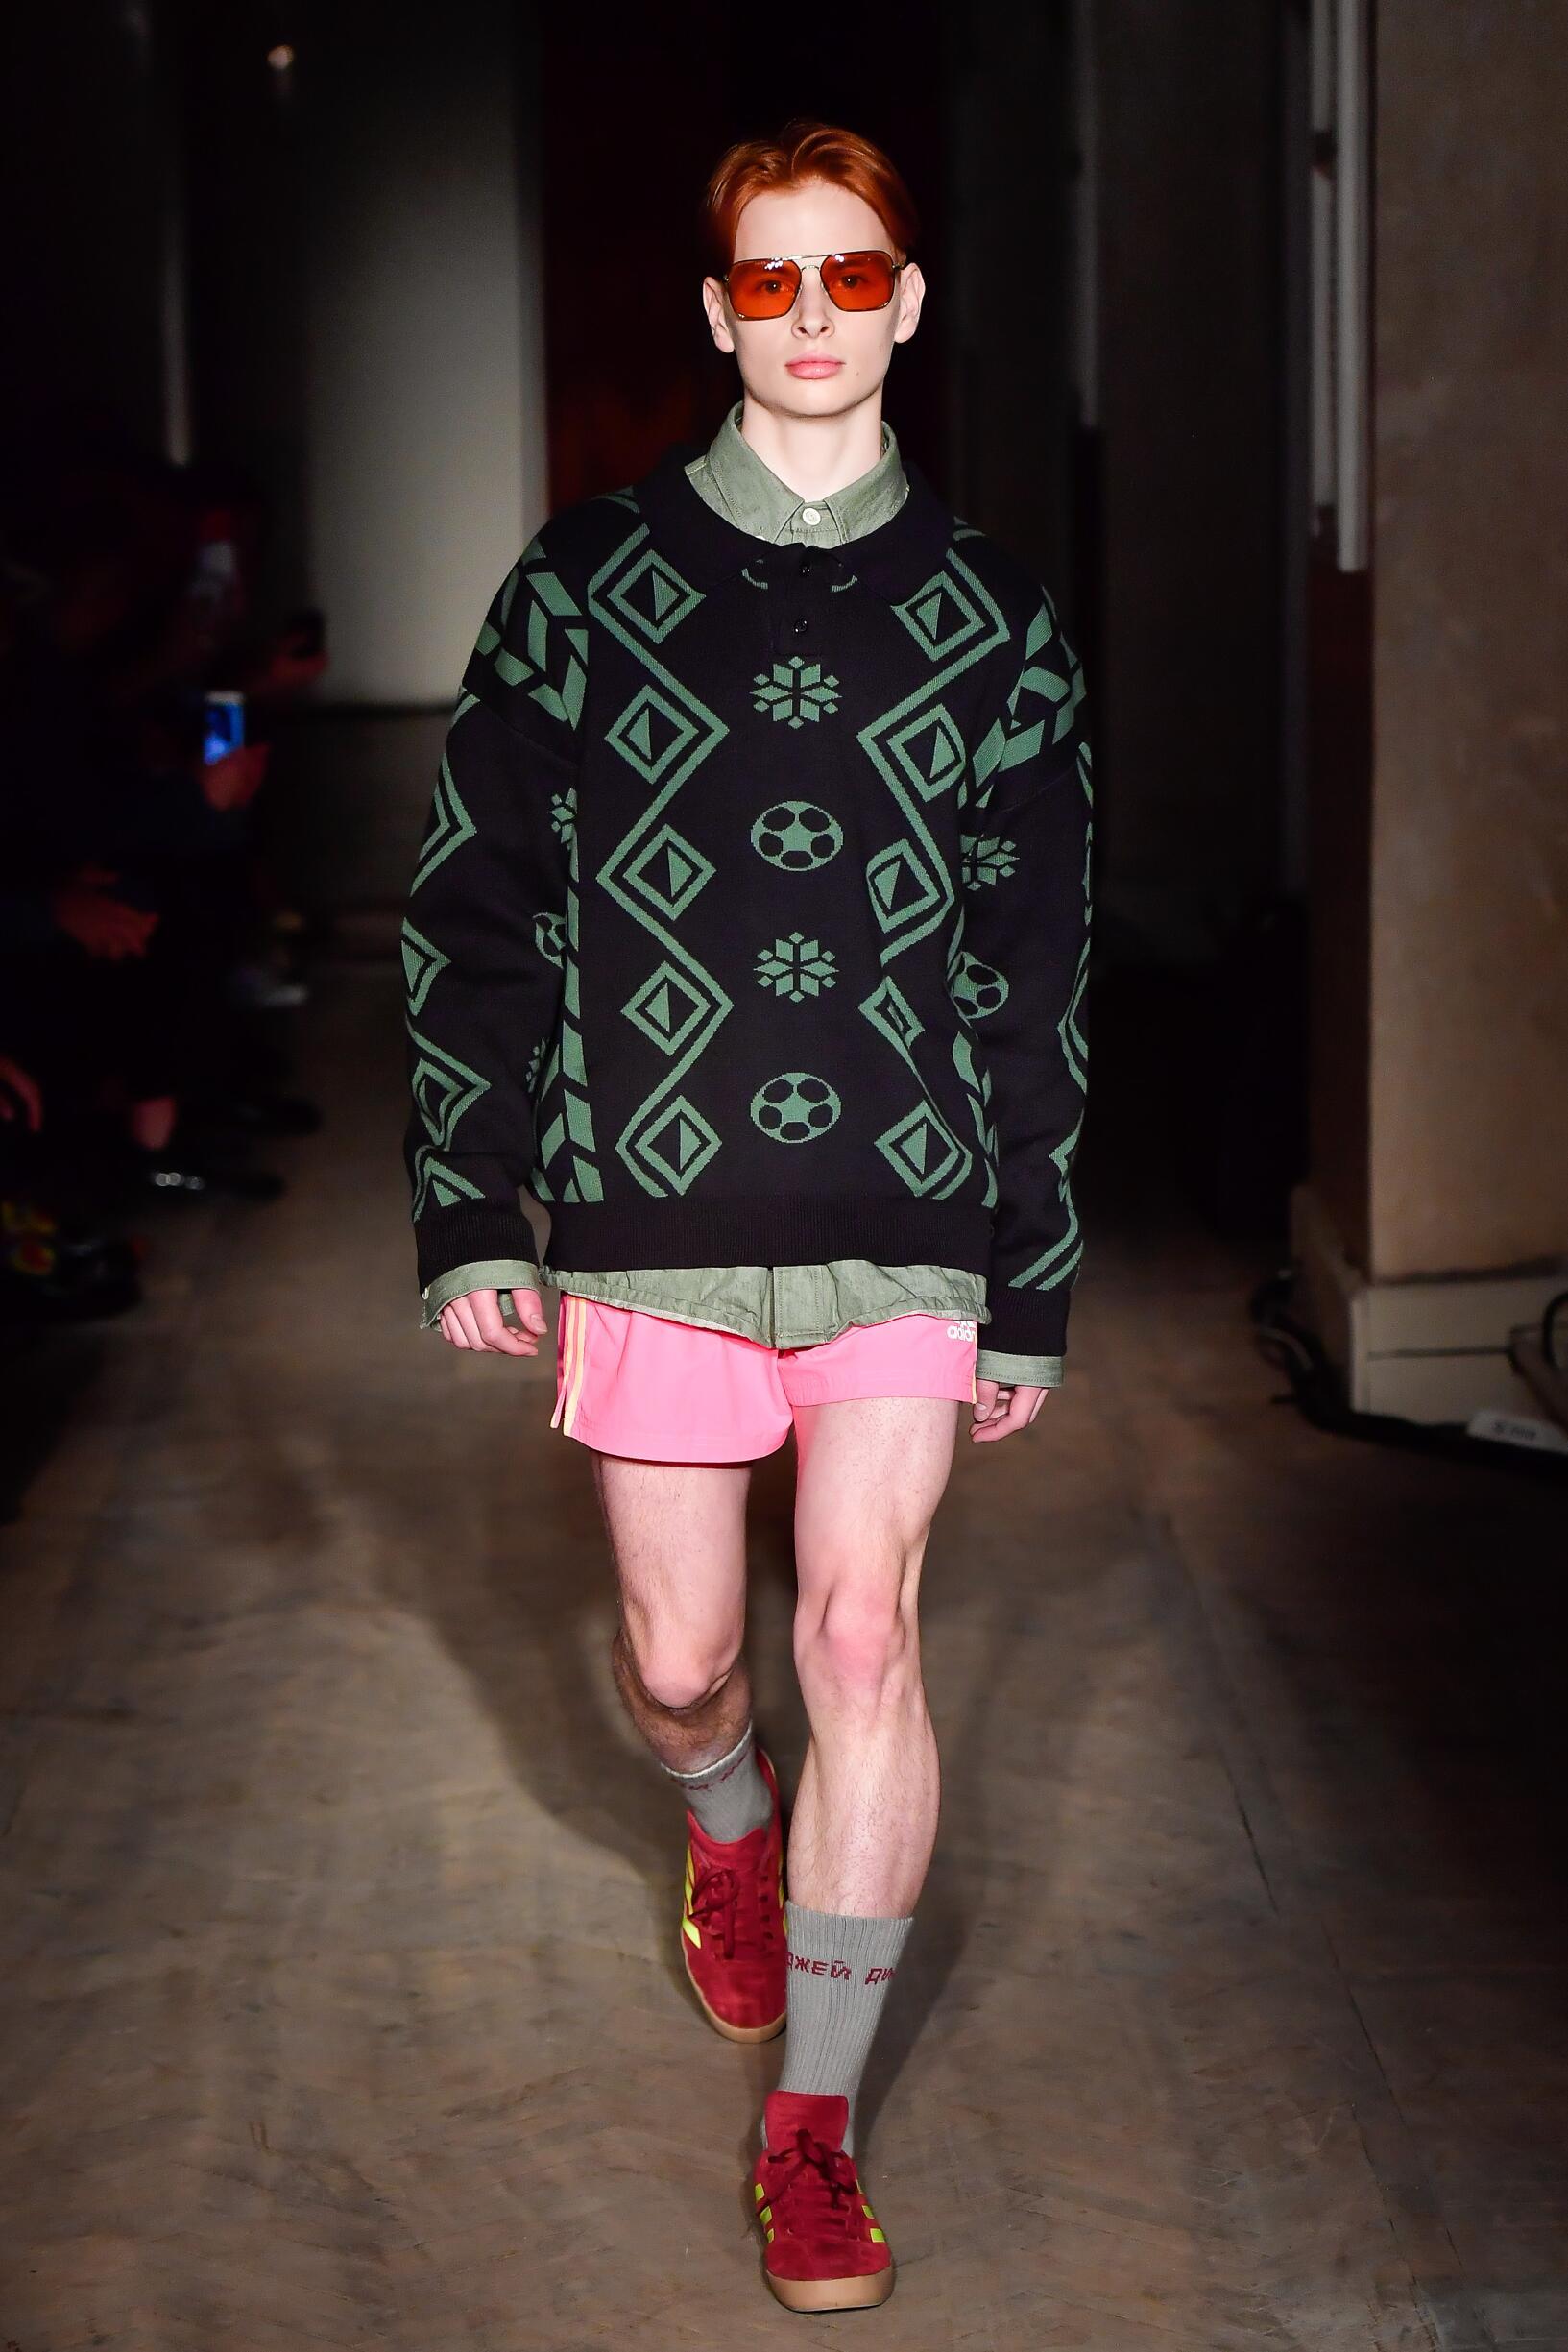 Man Summer 2018 Fashion Trends Gosha Rubchinskiy